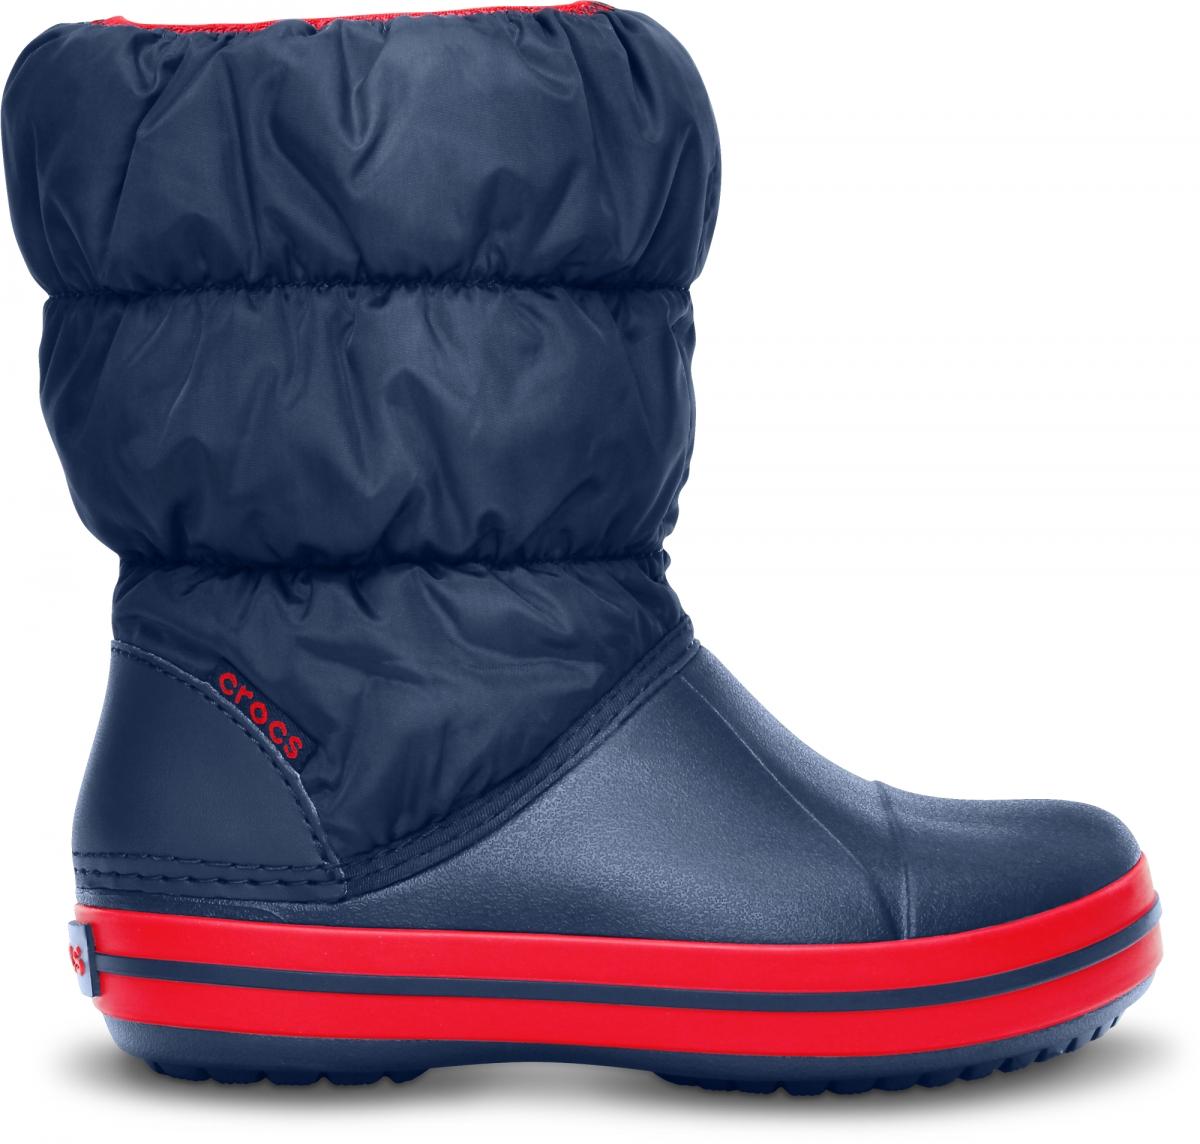 Crocs Winter Puff Boot Kids - Navy/Red, J1 (32-33)